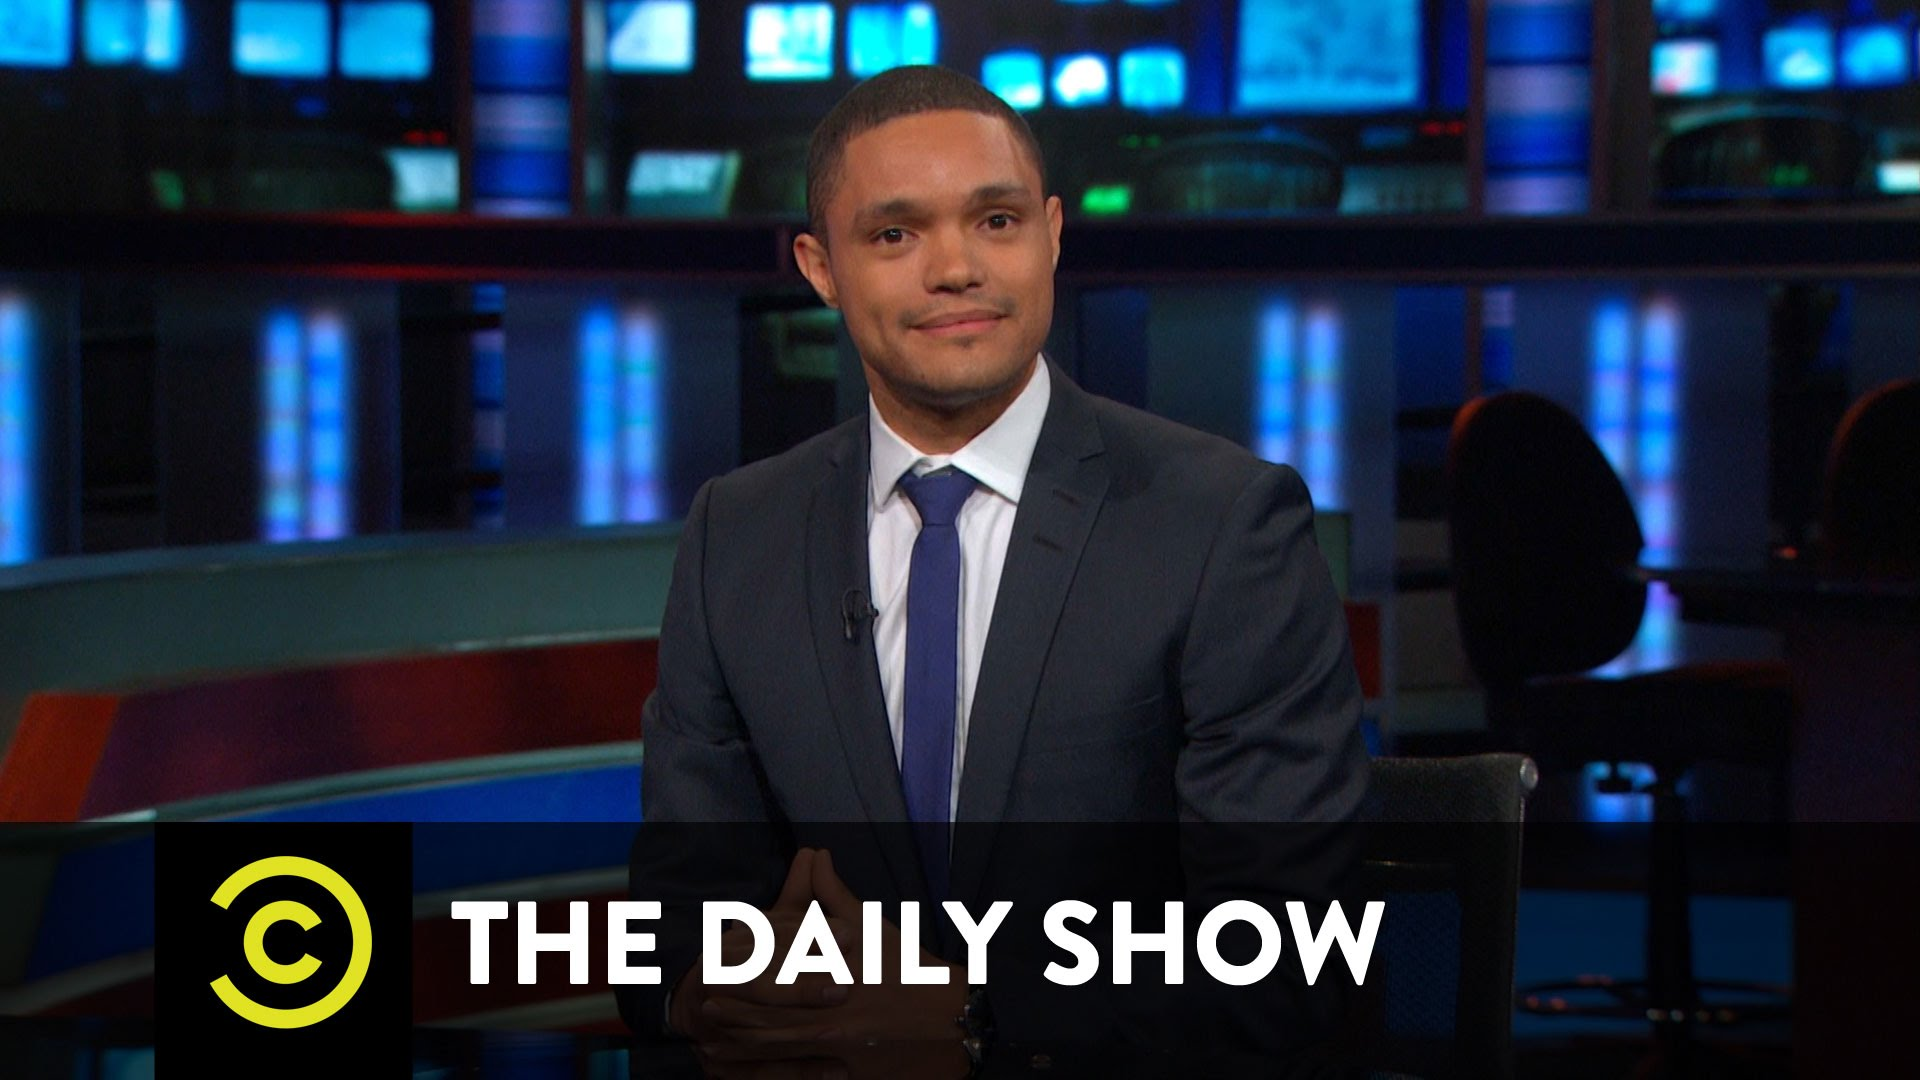 Trevor Noah to Succeed Jon Stewart on 'The Daily Show'